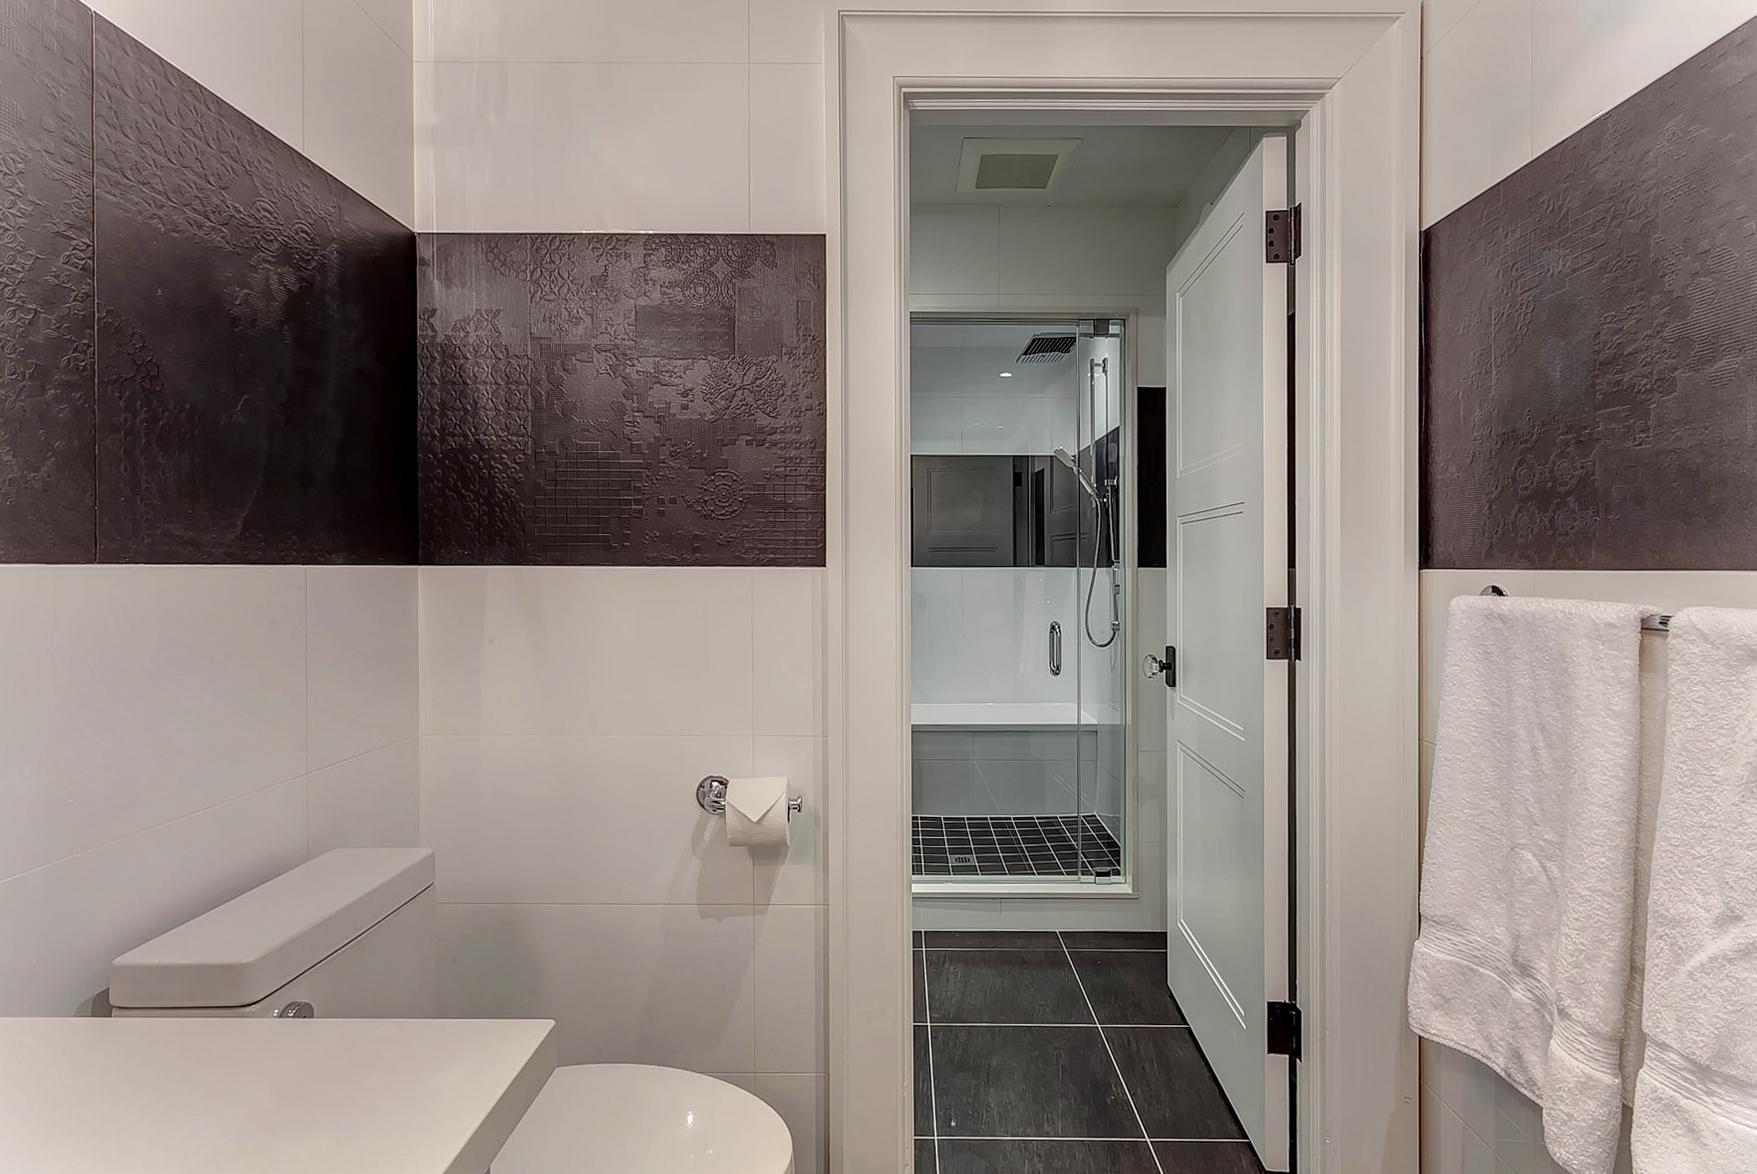 51-Bathroom.jpg